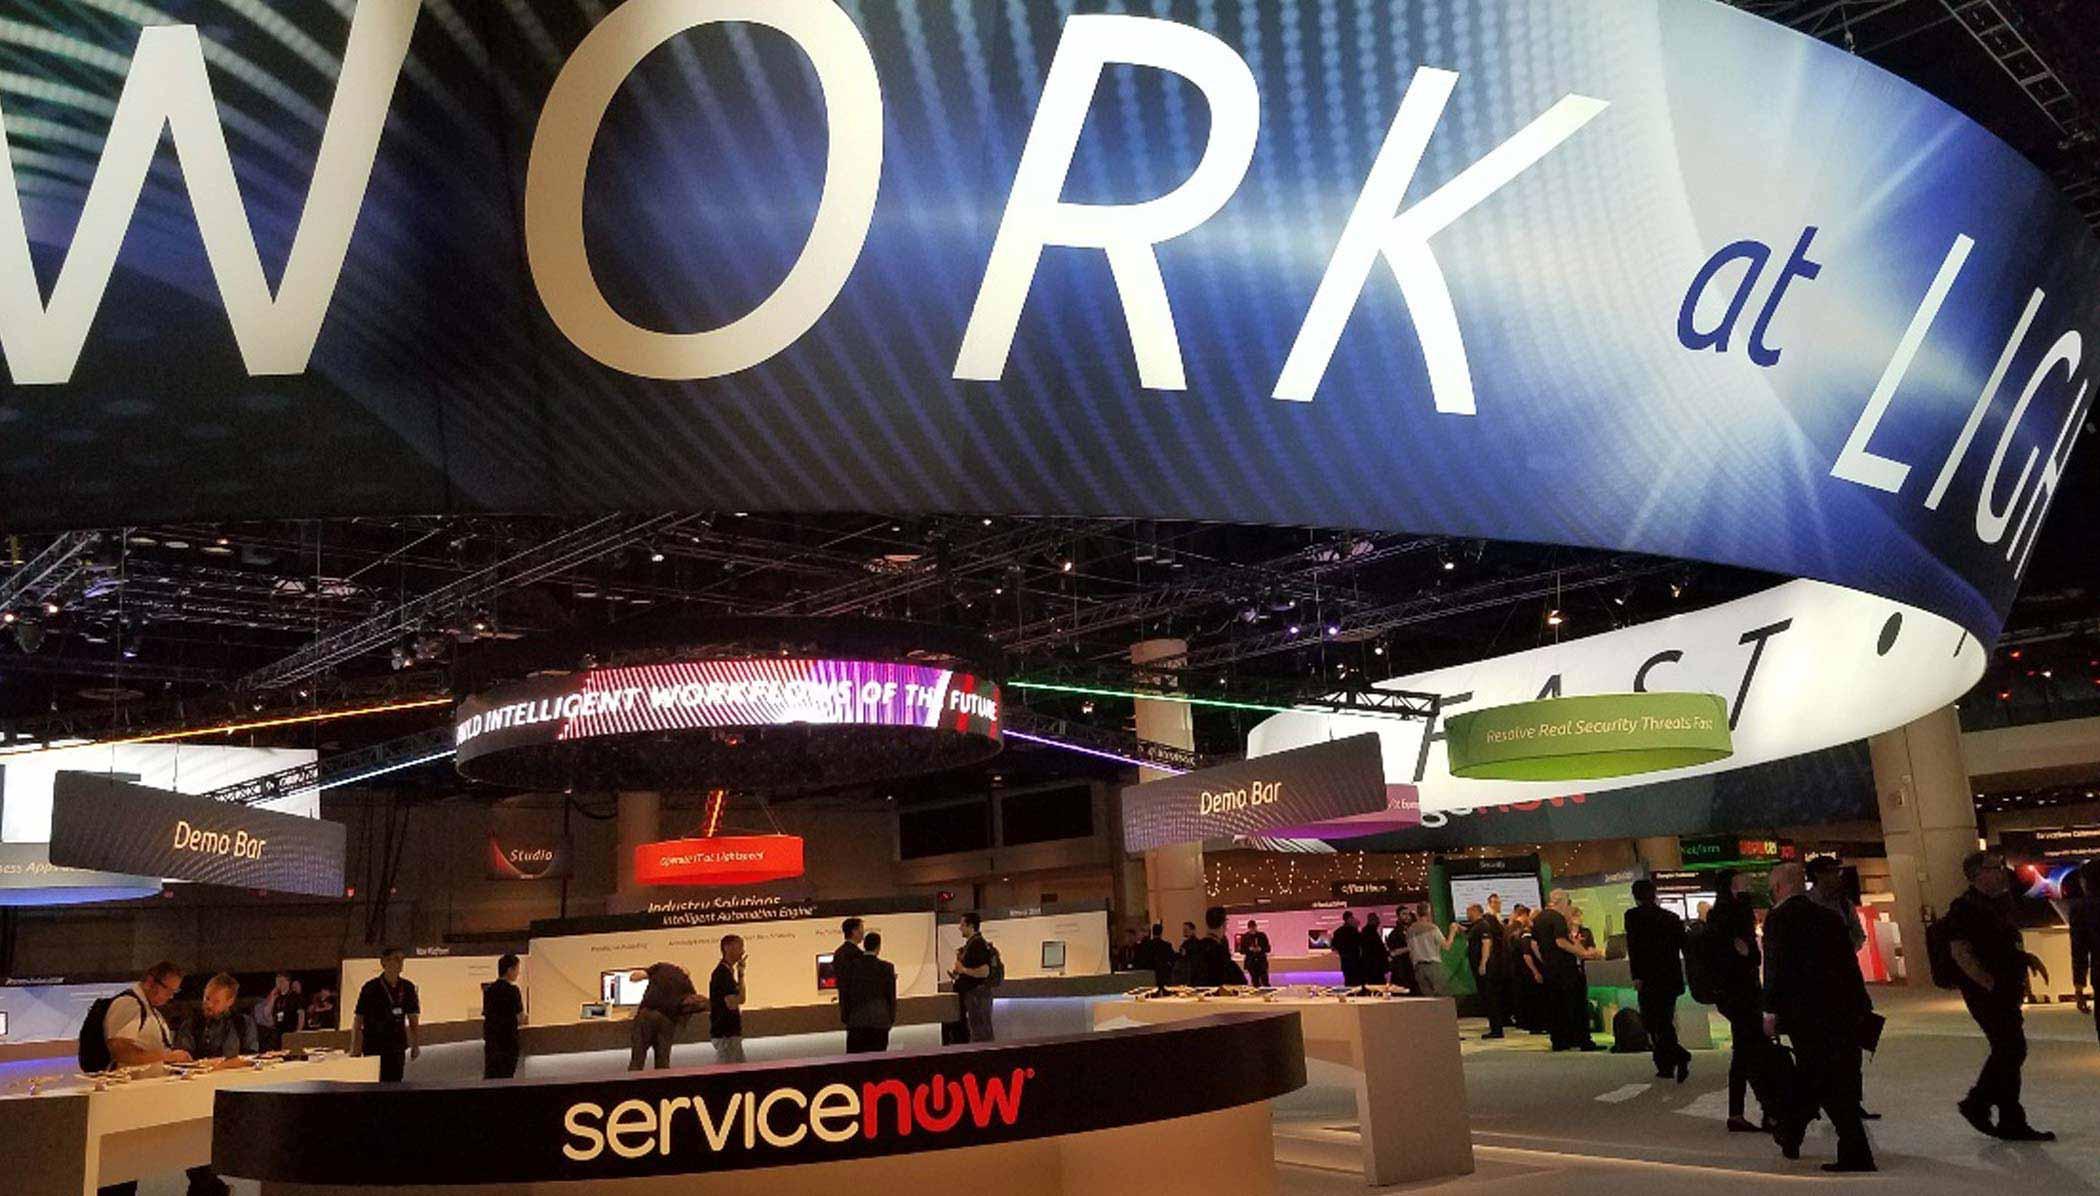 servicenow work at lightspeed